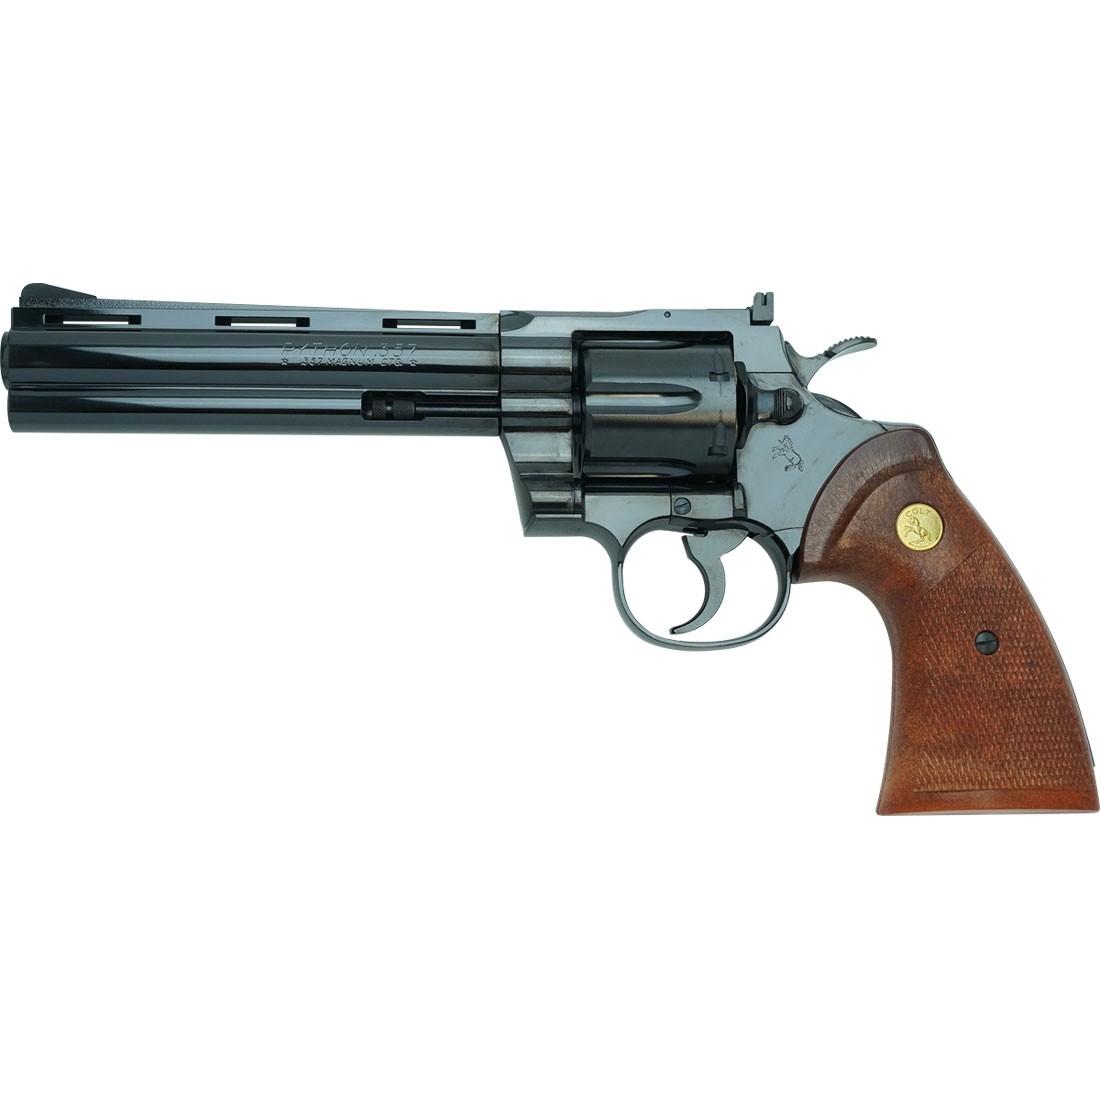 "Tanaka Colt Python .357 6"" Steel Finish Revolver"